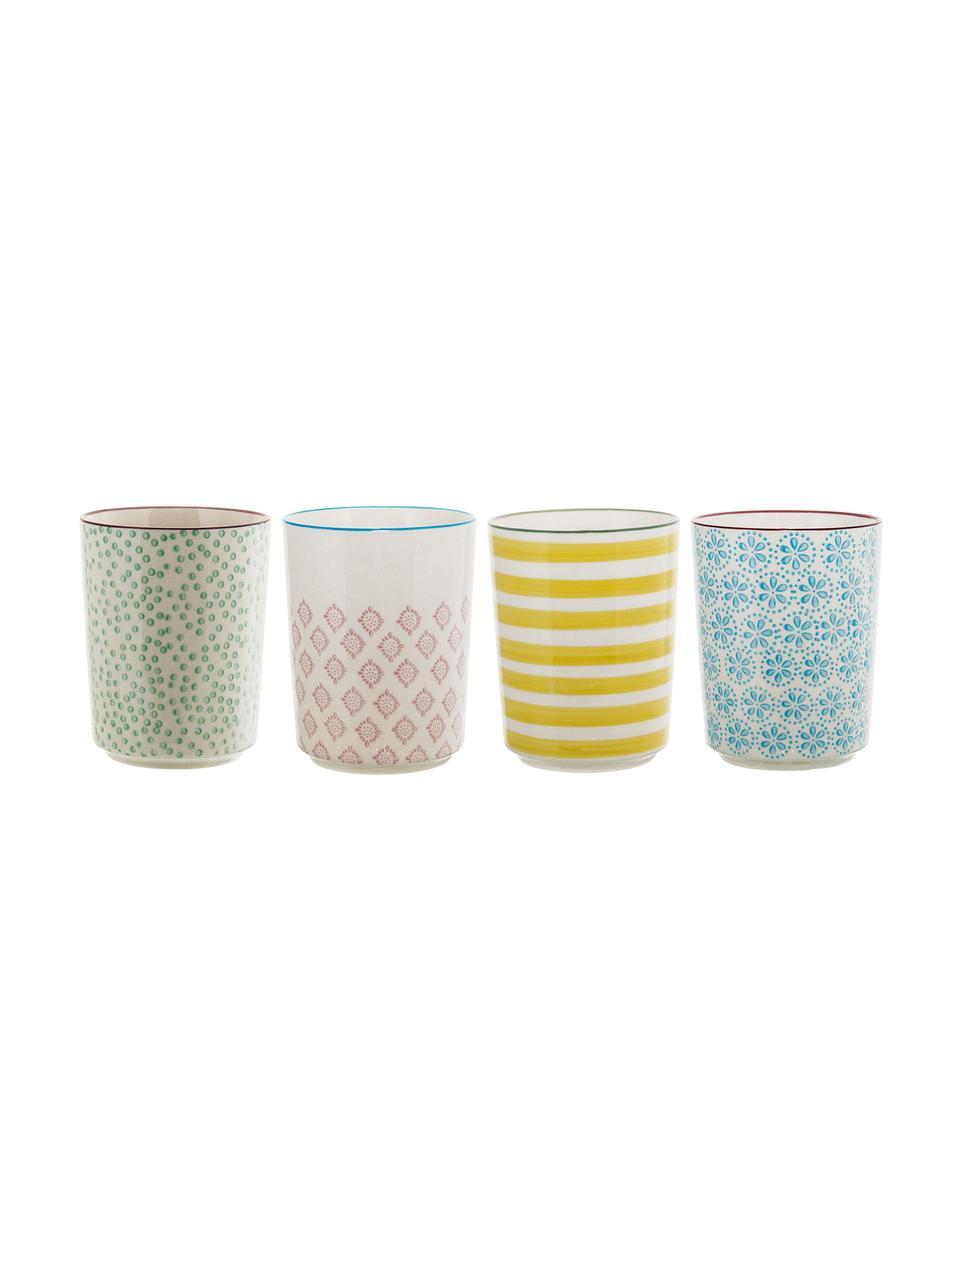 Set 4 tazze senza manico dipinte a mano Patrizia, Gres, Bianco latteo, multicolore, Ø 7 x Alt. 10 cm